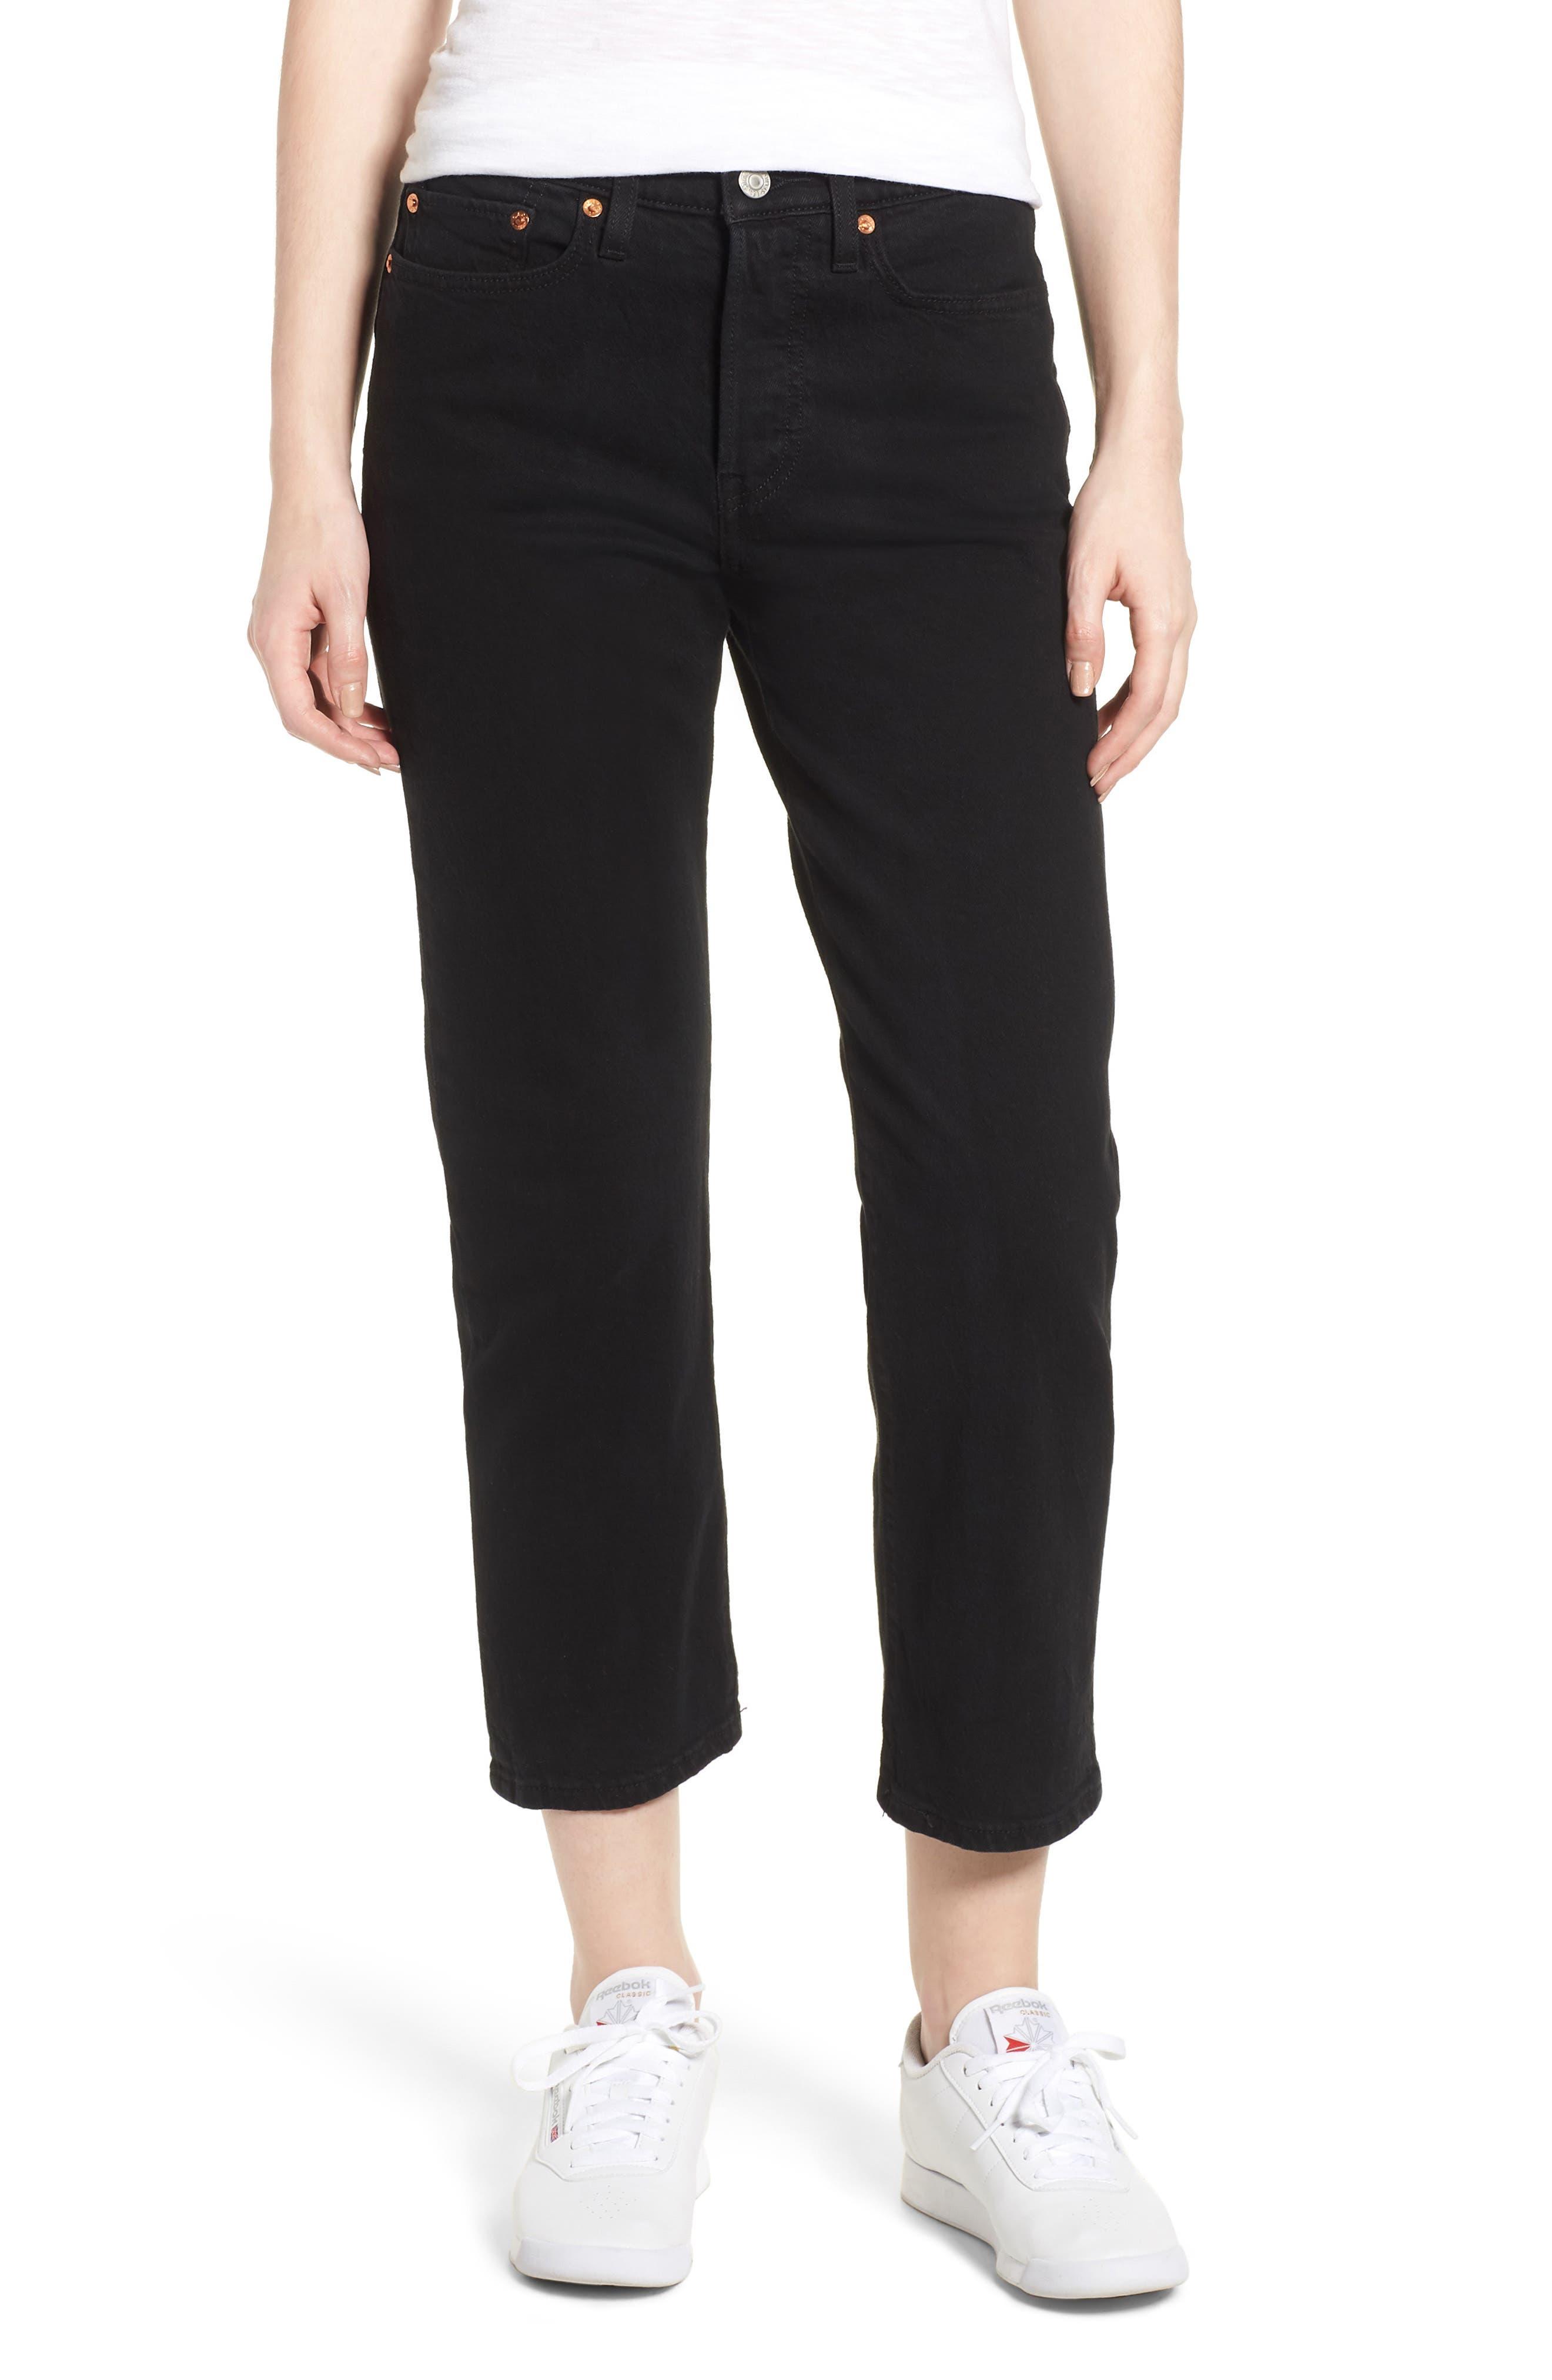 Women's Levi's Wedgie High Waist Straight Jeans,  27 x 26 - Black